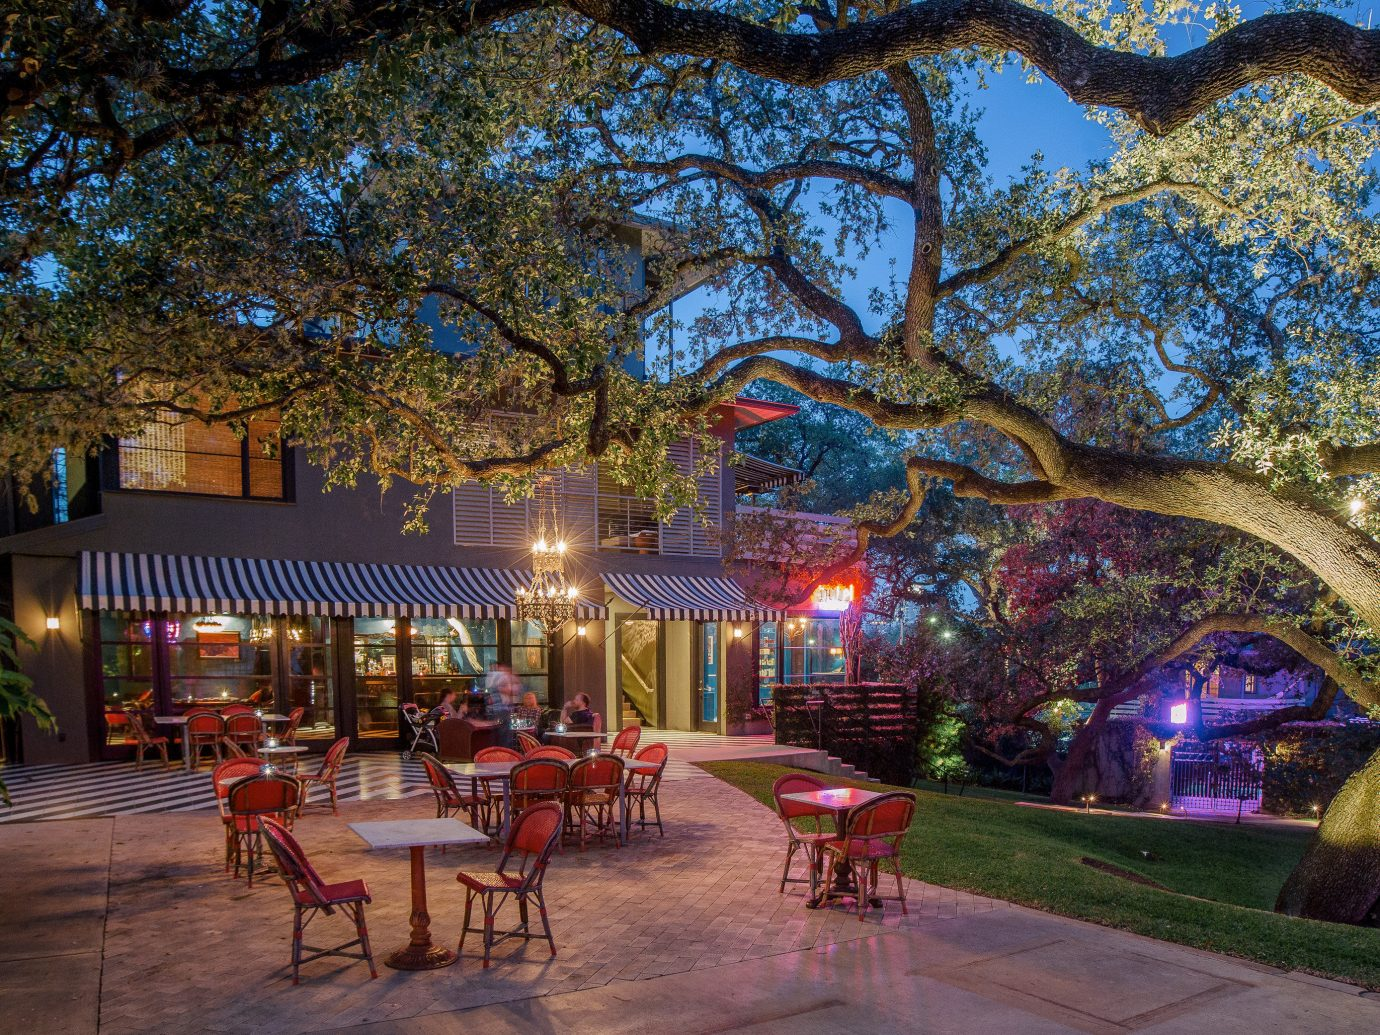 Hotels tree outdoor night estate evening flower Resort plant several